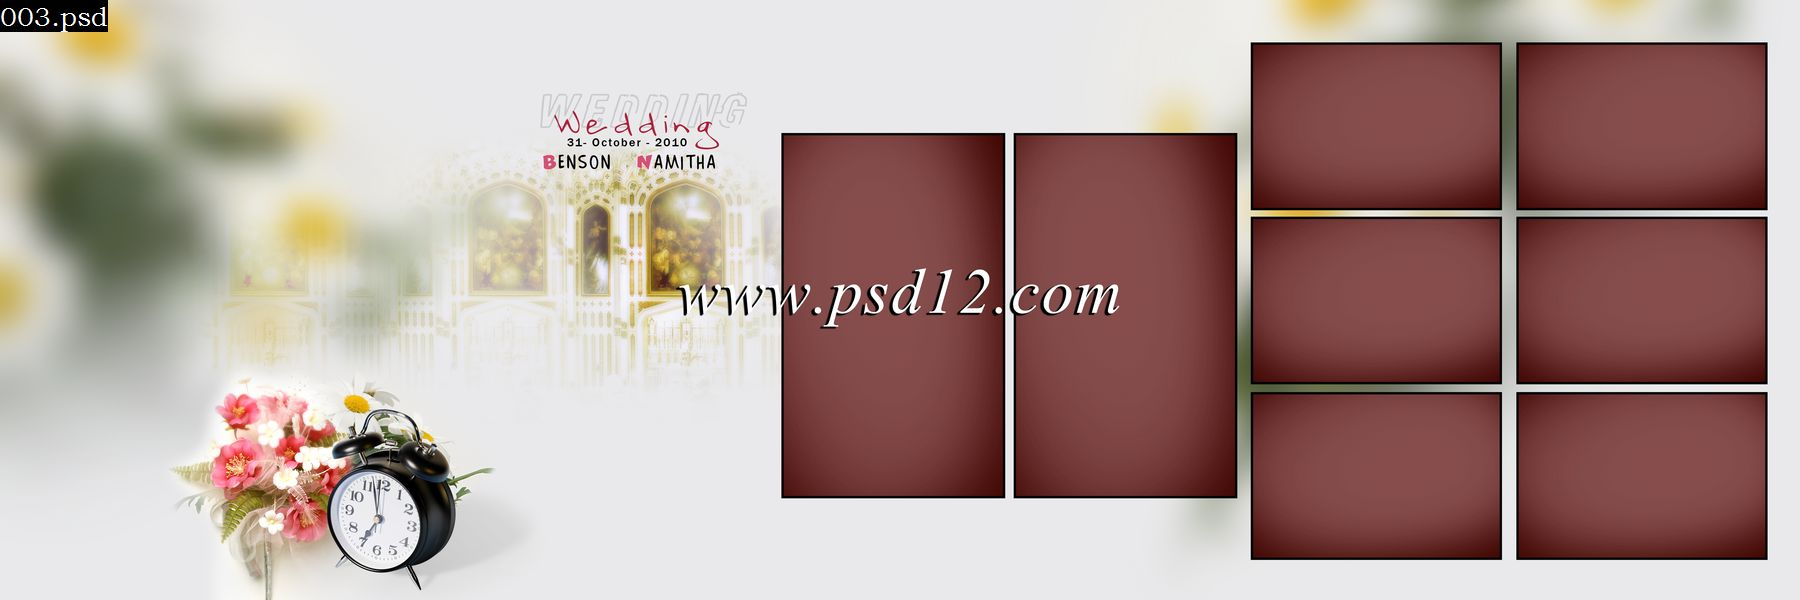 48 Karizma Photo Album PSD Template Size 12x36 - 11